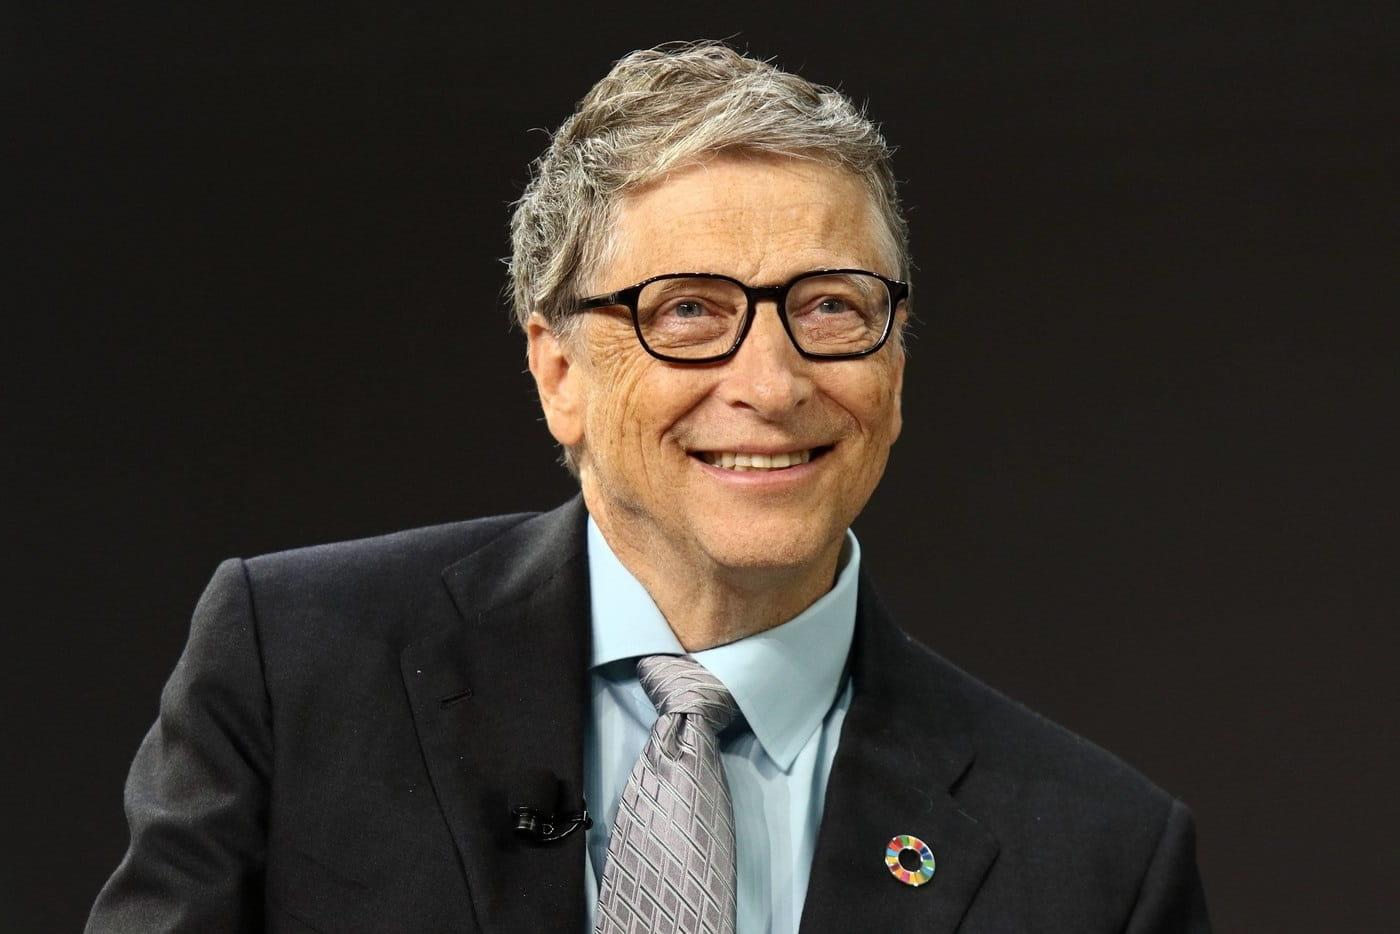 Билл Гейтс узнал о теориях заговора про себя и ему трудно на них возразить. Но не из-за правдивости обвинений